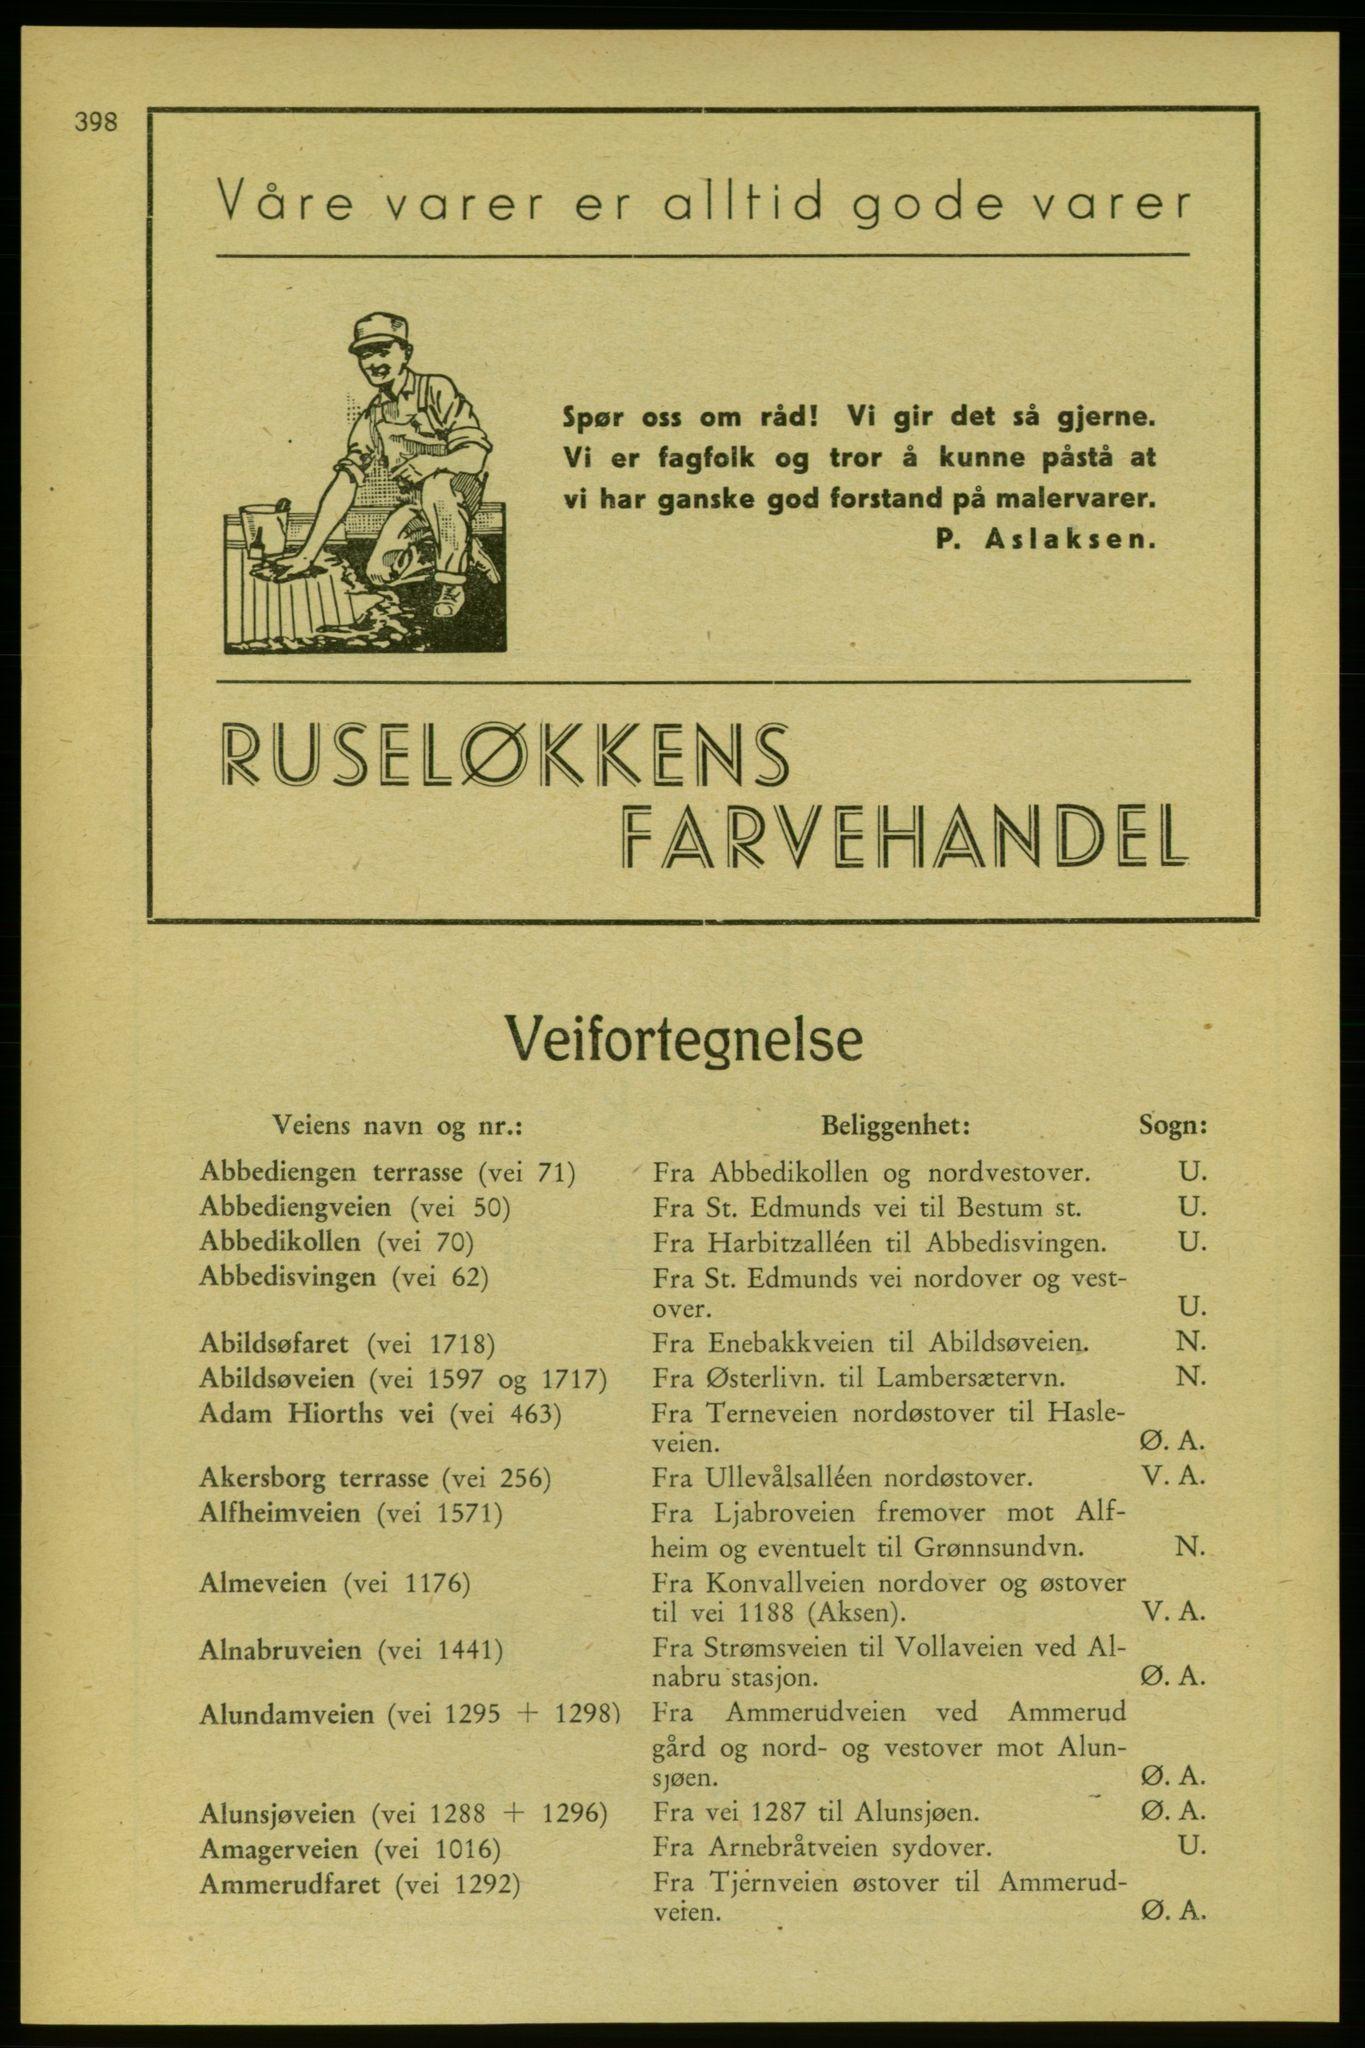 RA, Aker adressebok/adressekalender (publikasjon)*, 1937-1938, p. 398